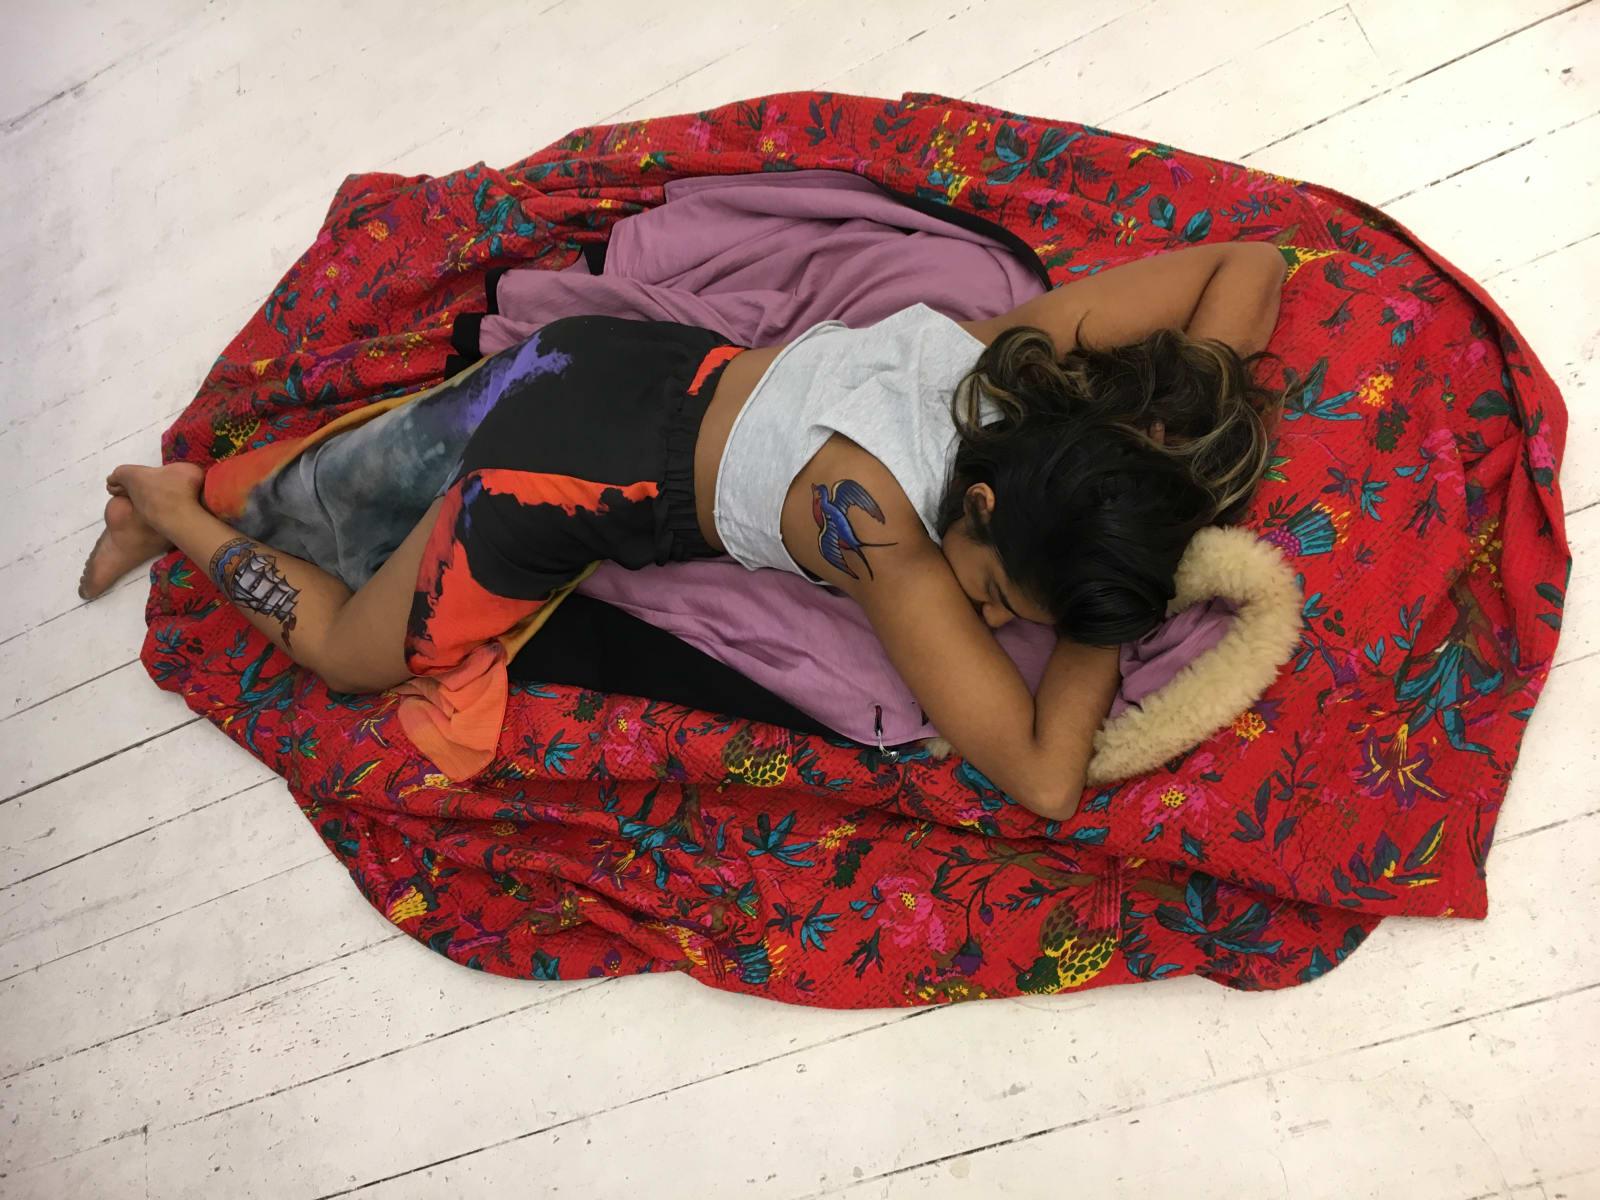 Michelle Williams Gemaker, 2017, Violet culbo, stowaway. Performed by Ananya Jaidew, make-up Helena Jopling